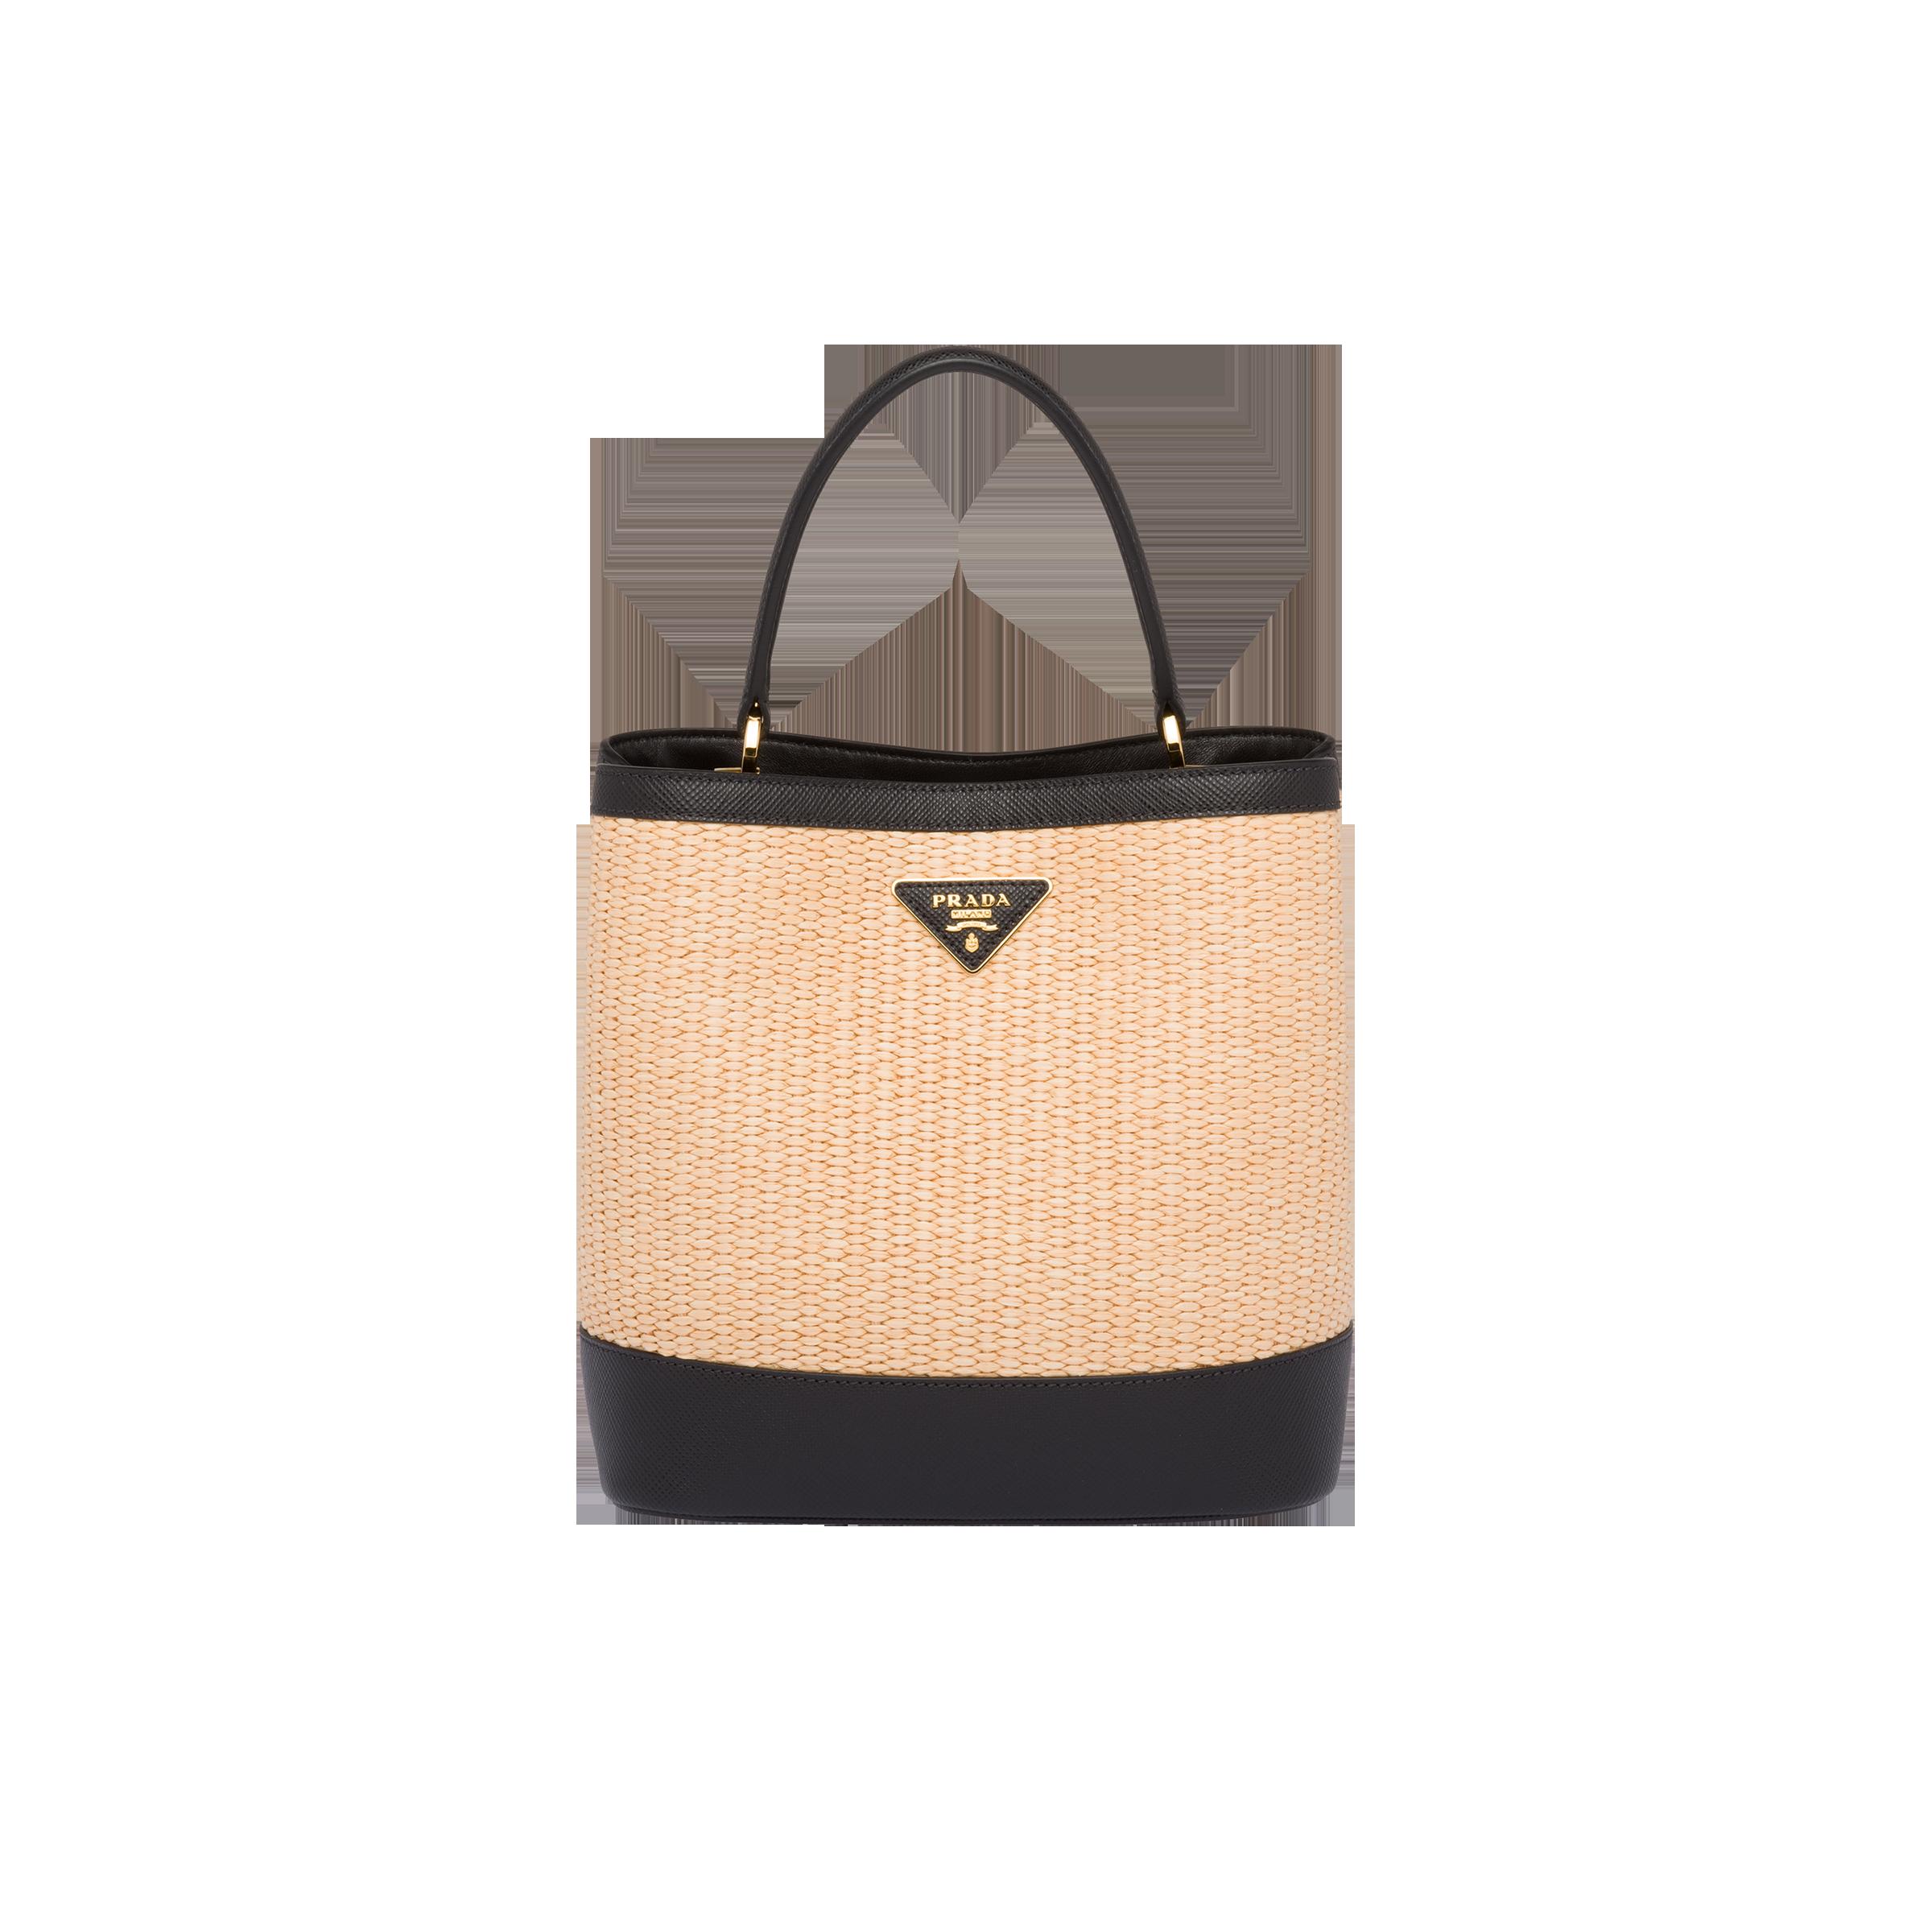 fb8017402c6d Women s Bags